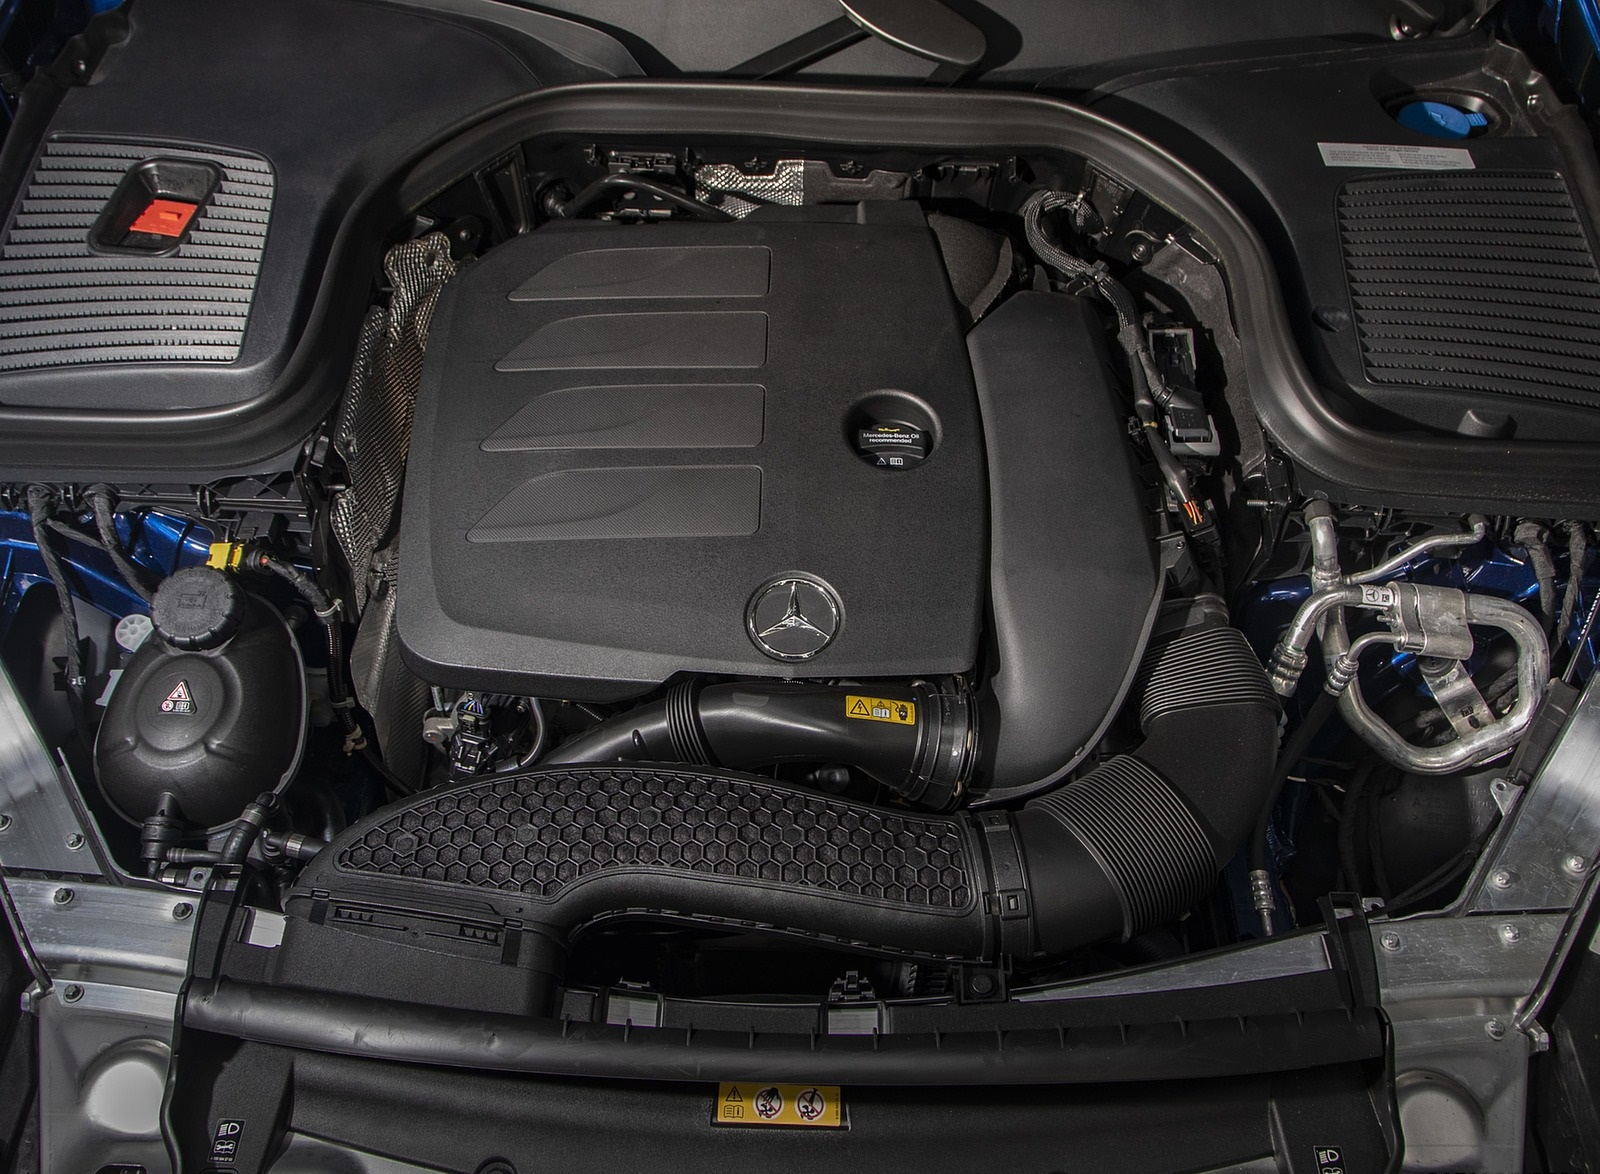 2020 Mercedes-Benz GLC 300 (US-Spec) Engine Wallpapers #15 of 62